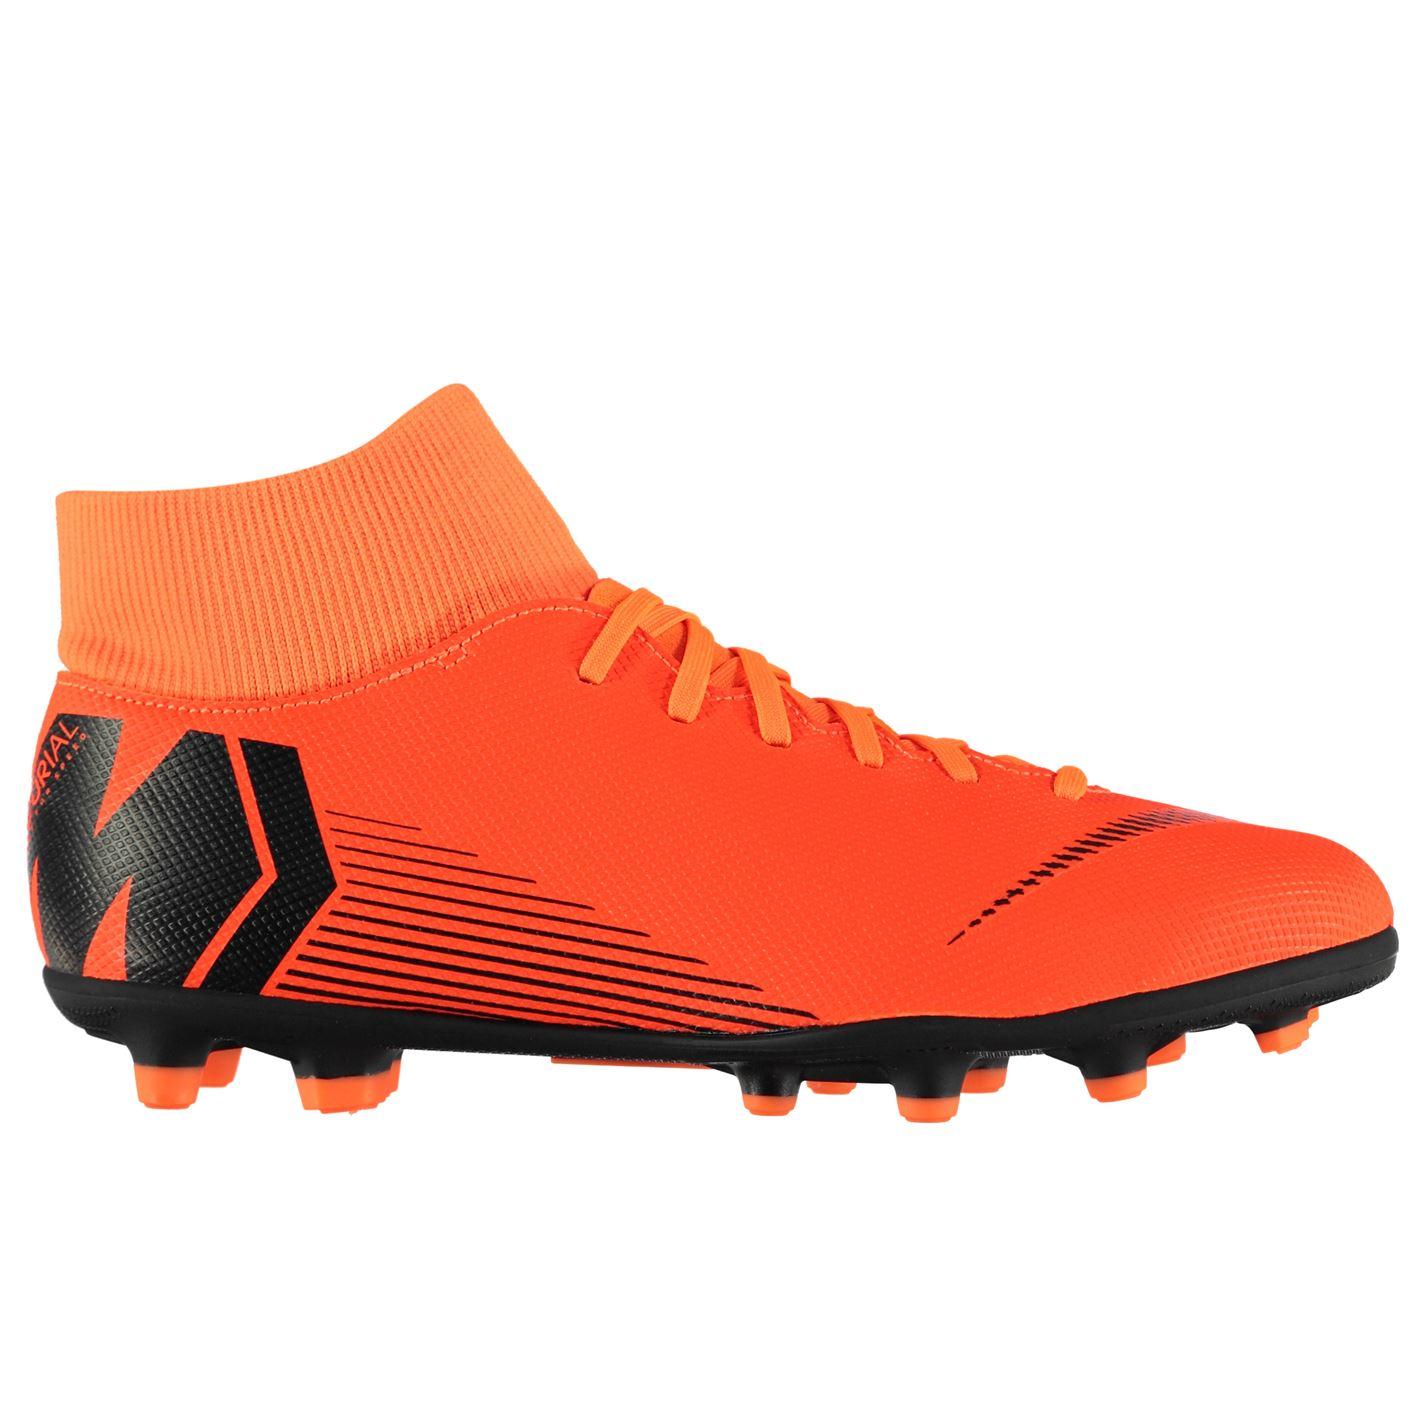 Nike Mercurial Superfly Club Mens FG Football Boots